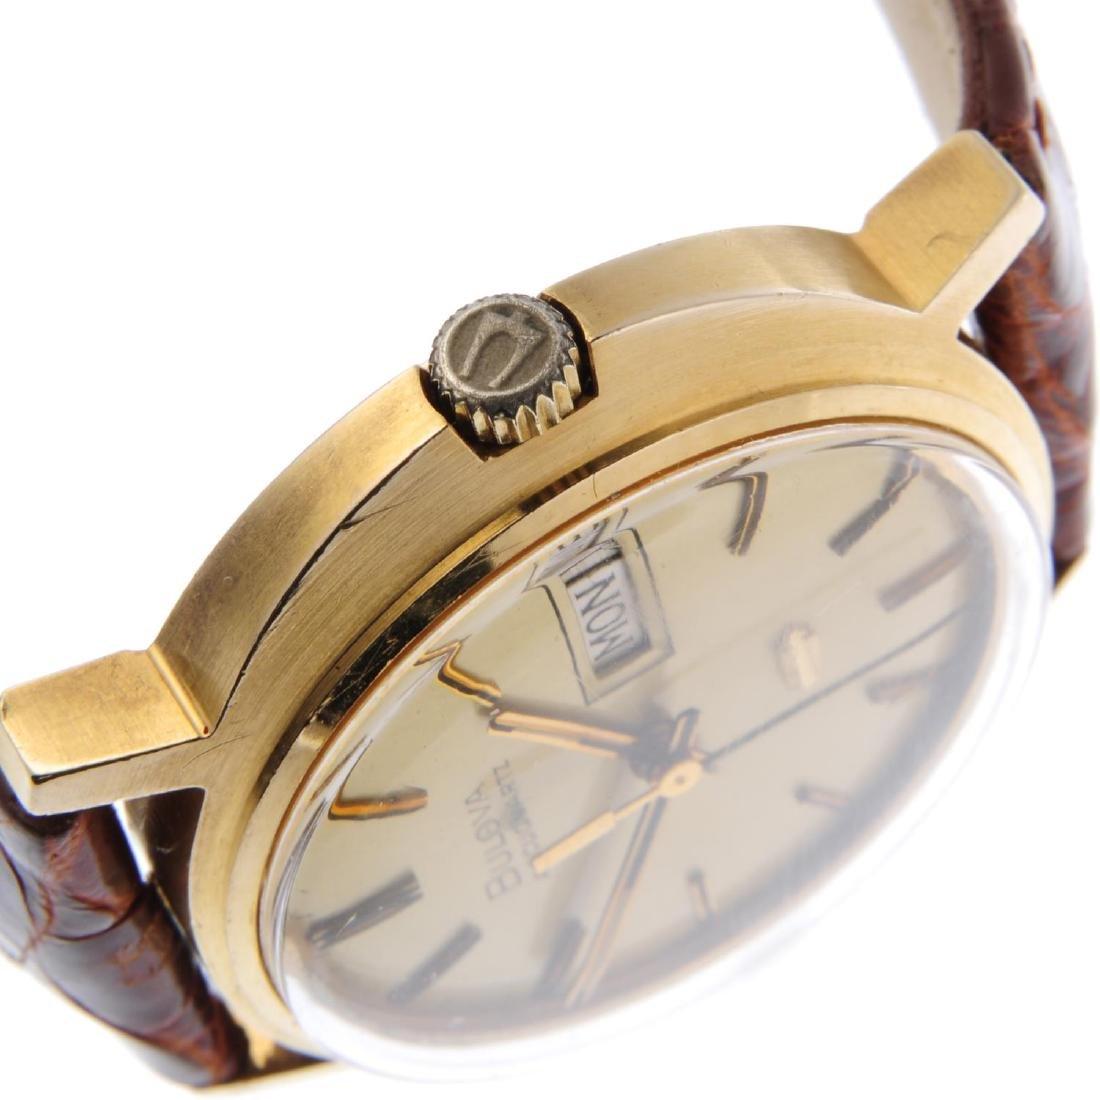 BULOVA - a gentleman's Accuquartz wrist watch. 9ct - 4